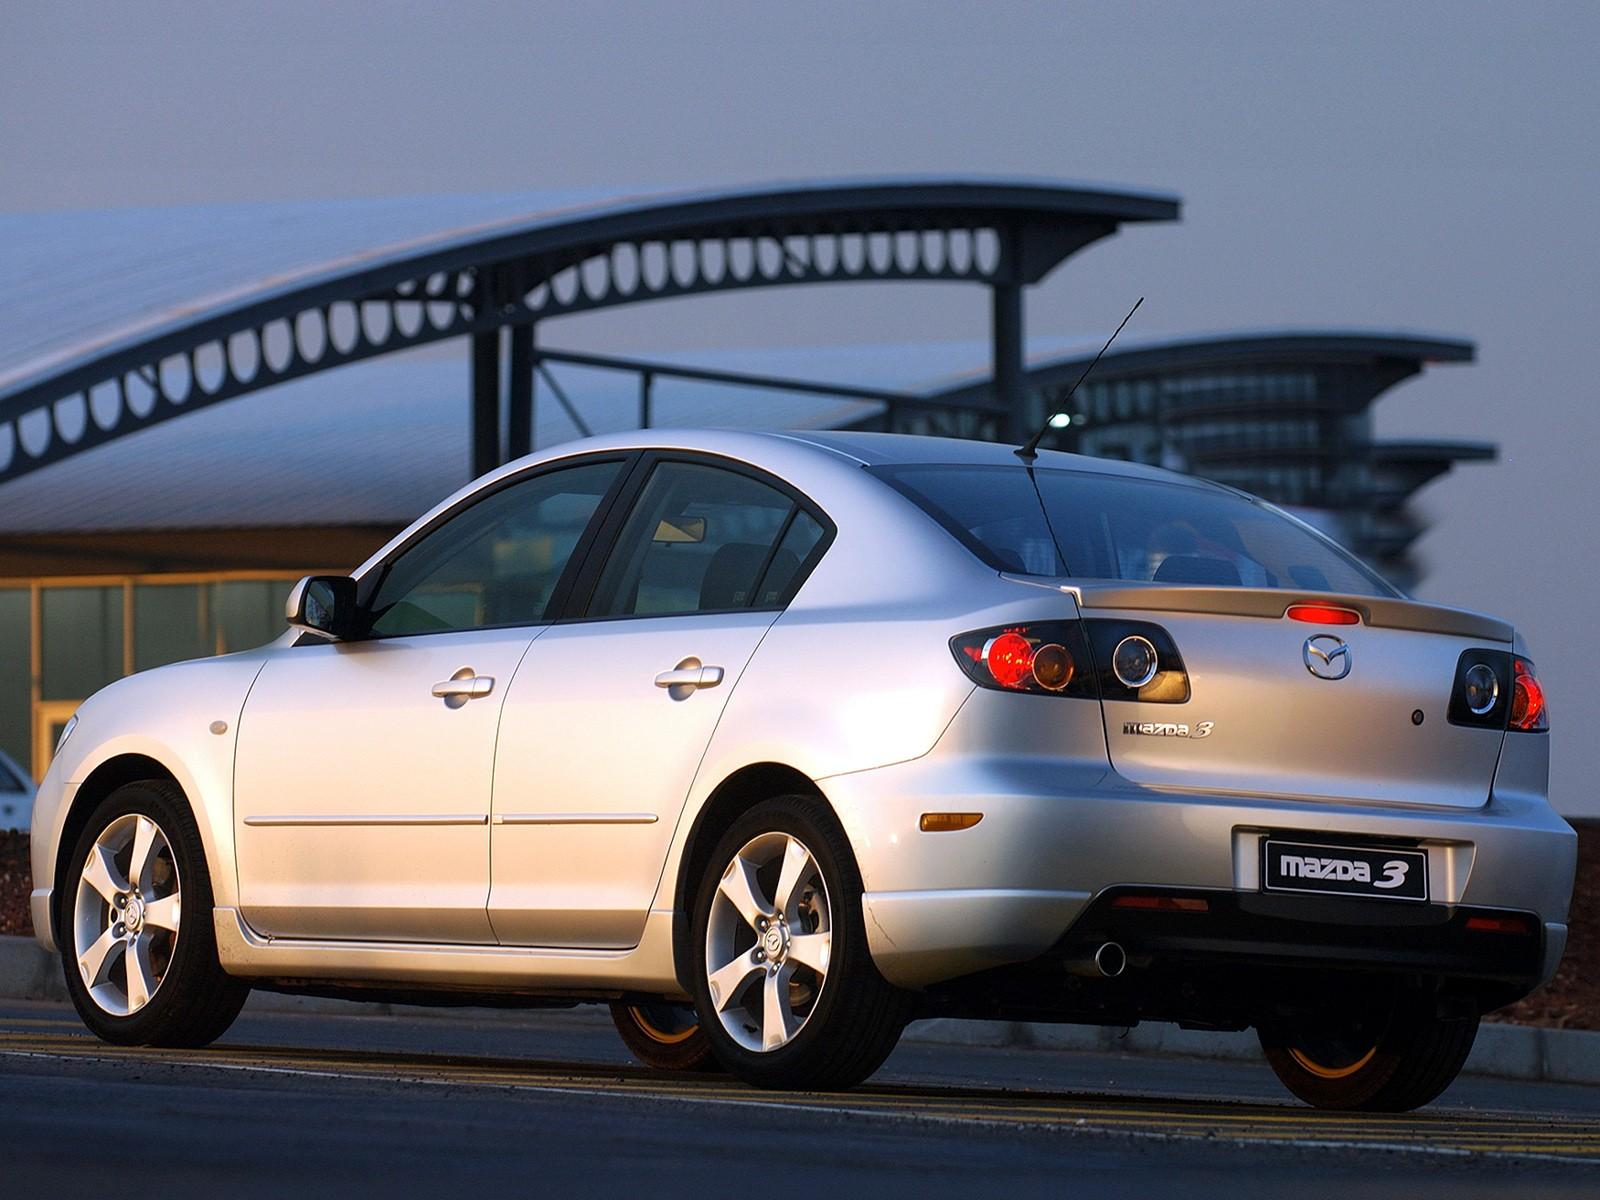 Superb ... MAZDA 3 / Axela Sedan (2004   2009) ...